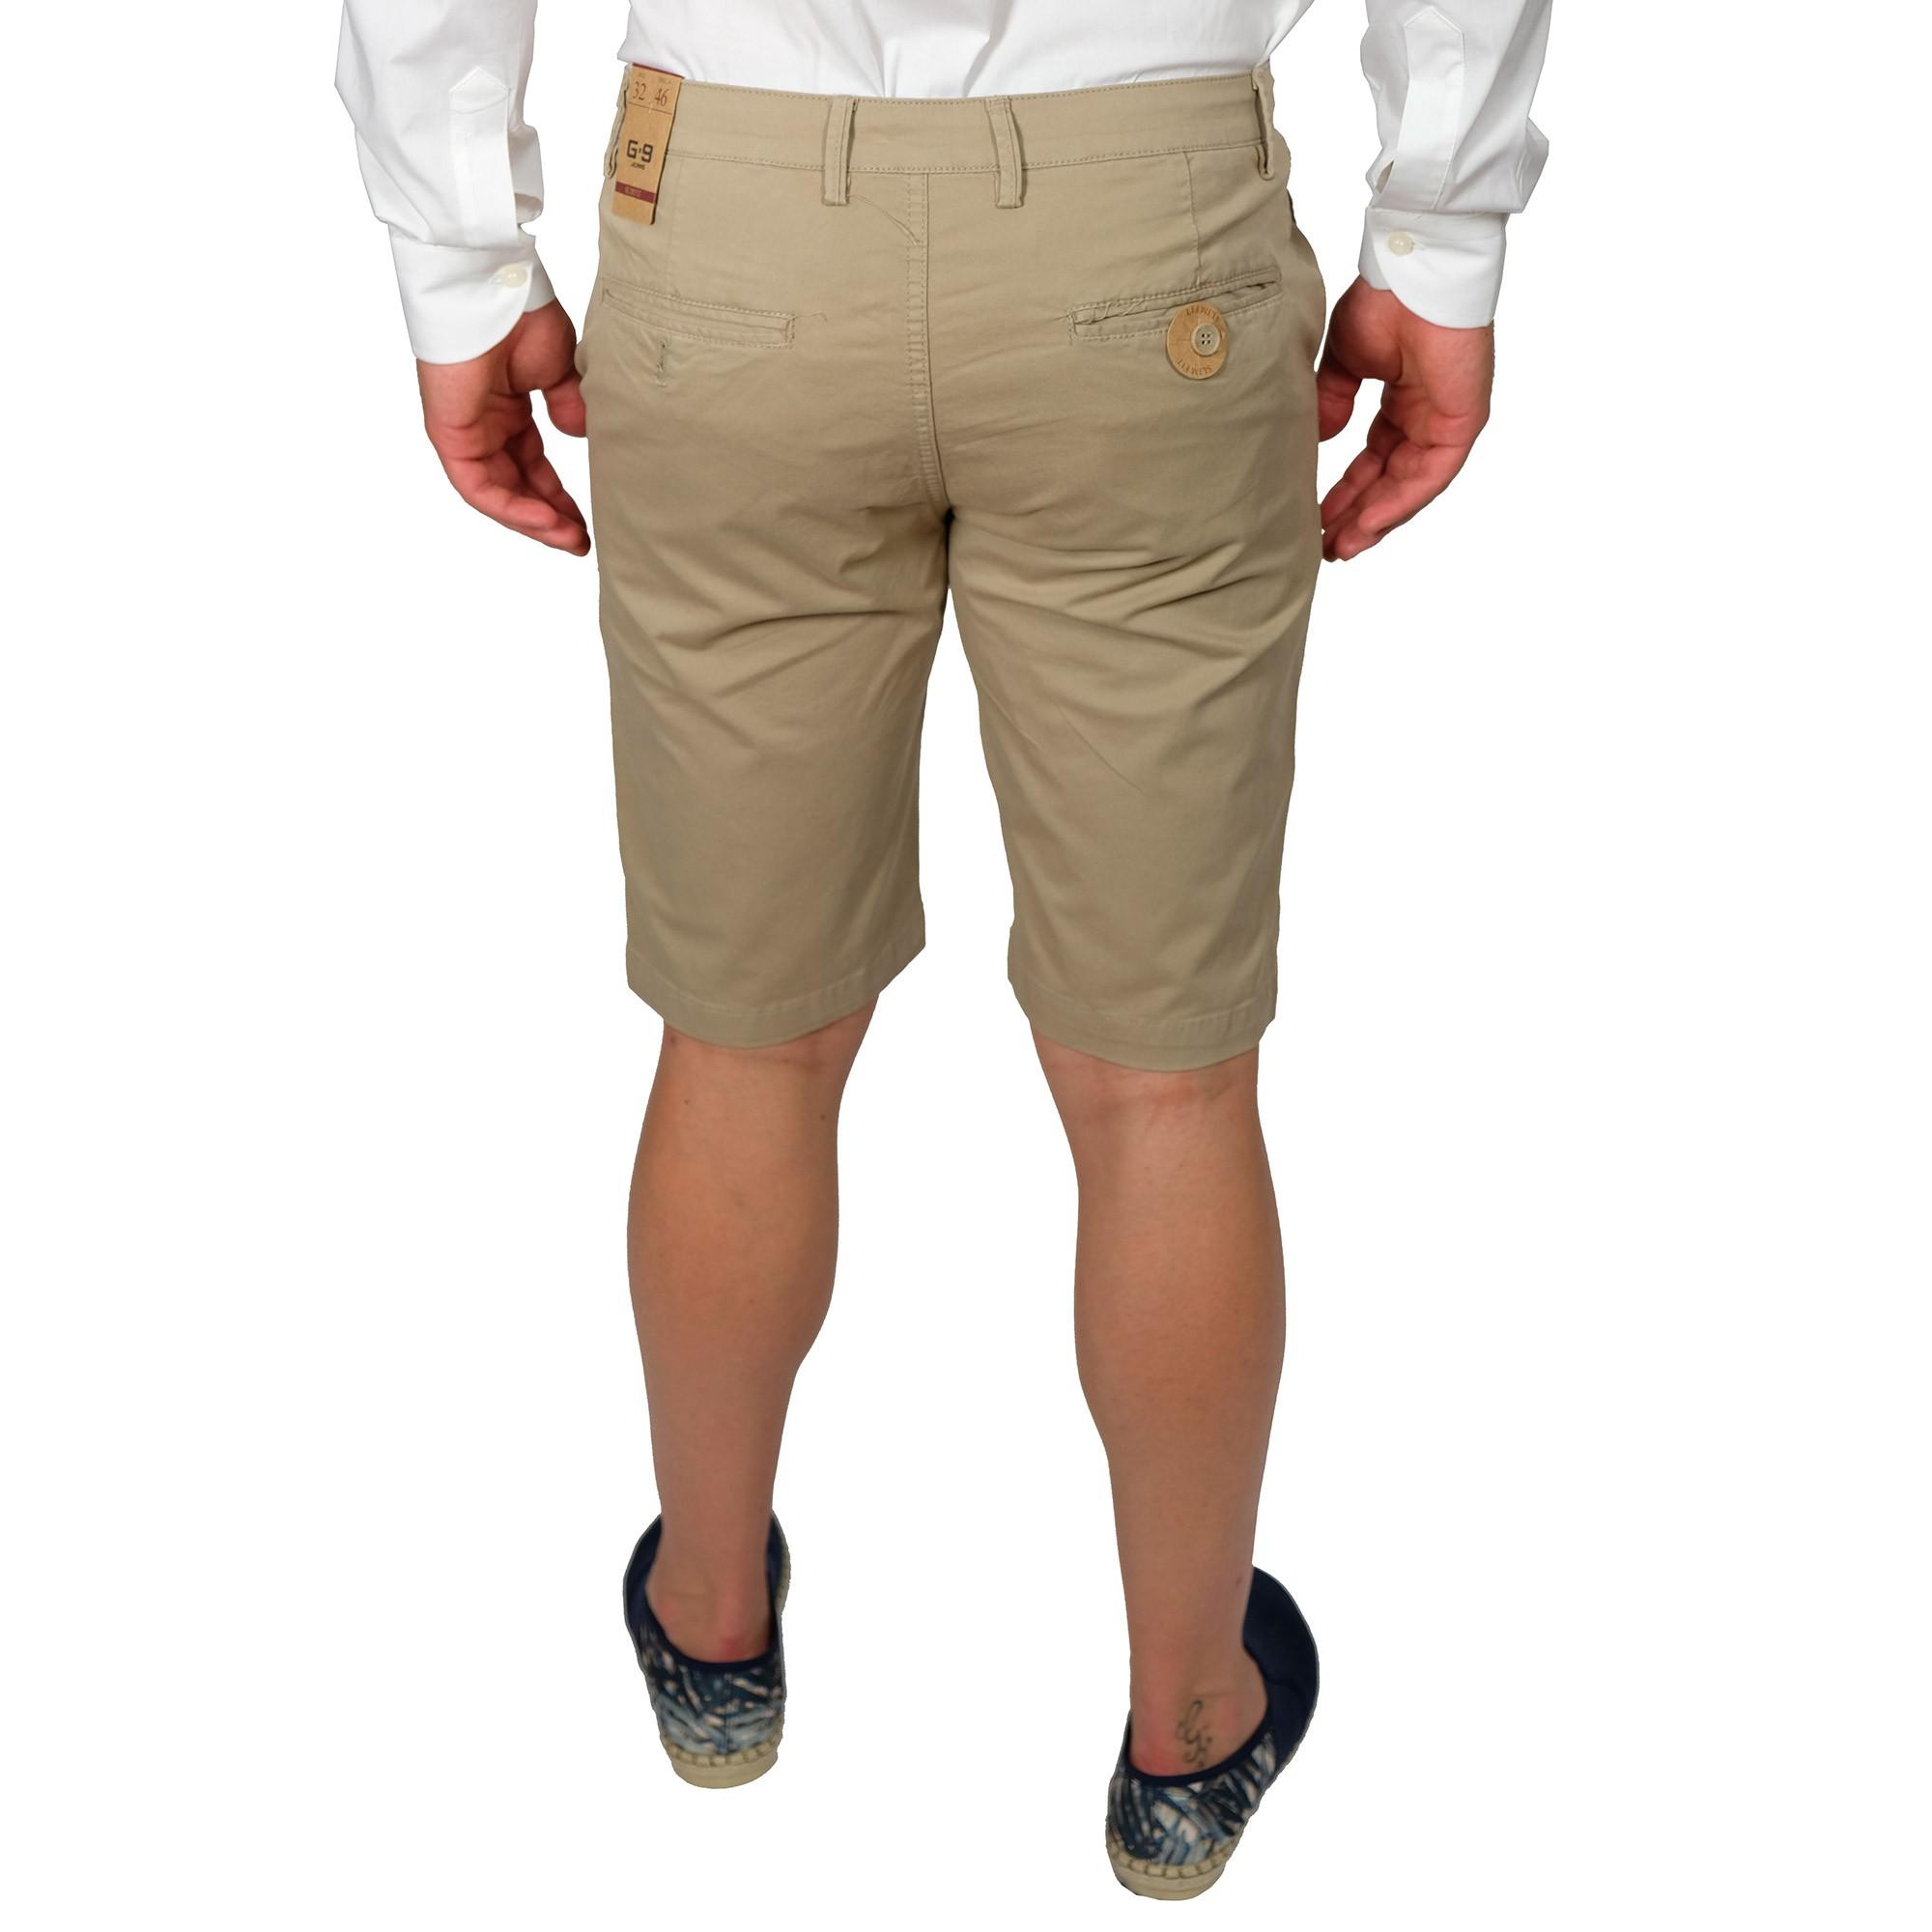 Bermuda-Uomo-Cotone-Jeans-Pantaloncini-Pantaloni-Corti-Tasca-America-Slim-Shorts miniatura 13